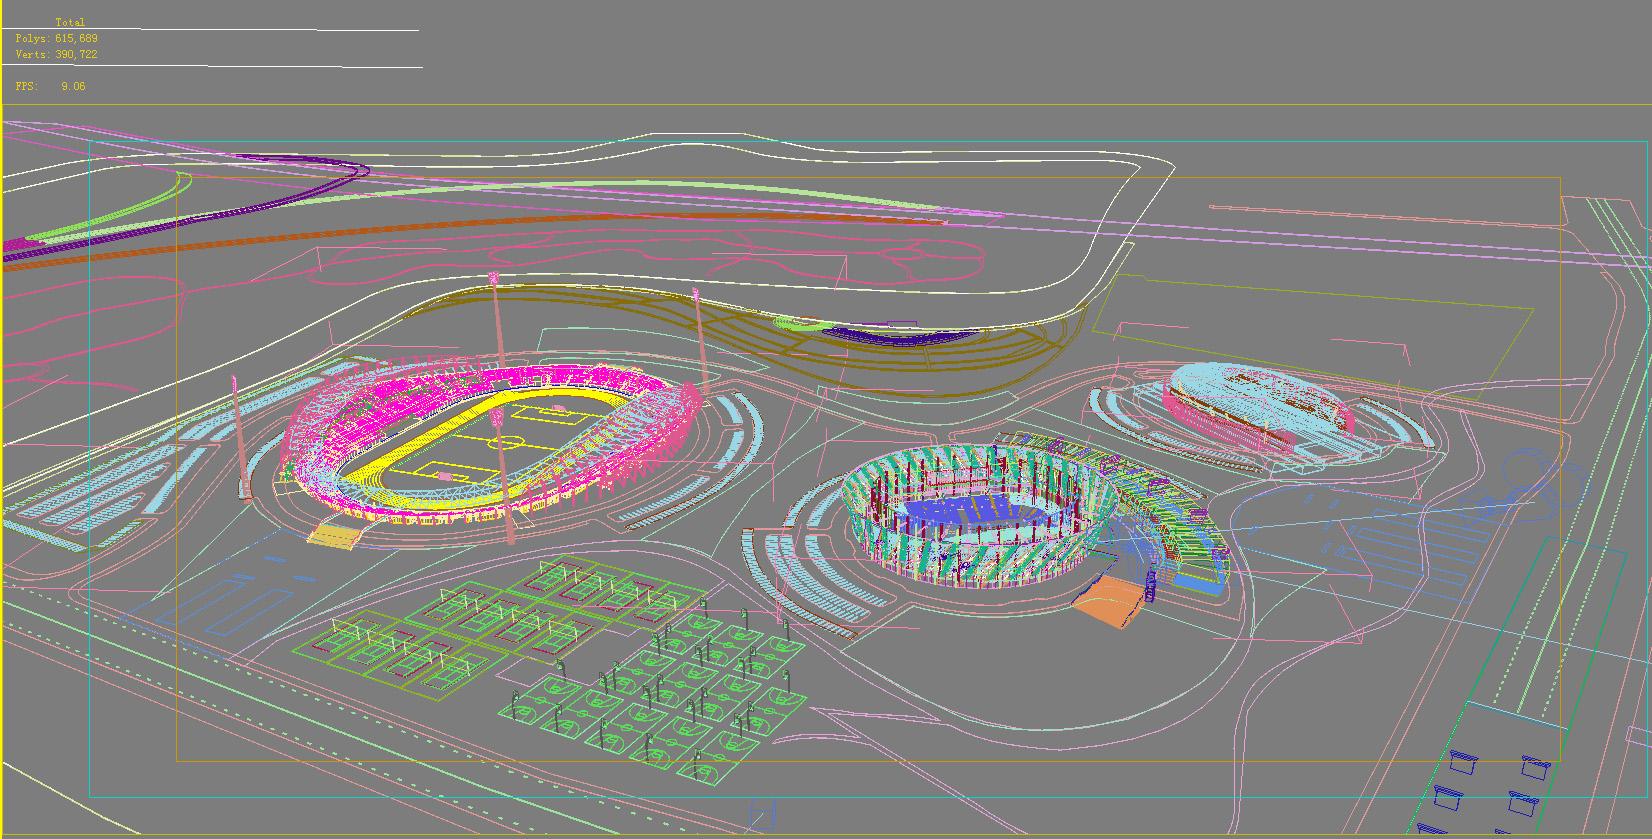 grand stadium 009 3d model 3ds max psd obj 98274